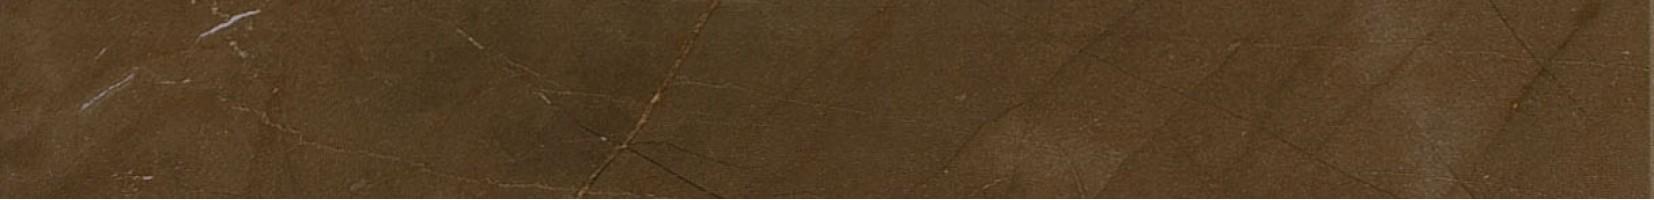 Бордюр Italon Charme Bronze Listello Lap 7.2x60 610090000729